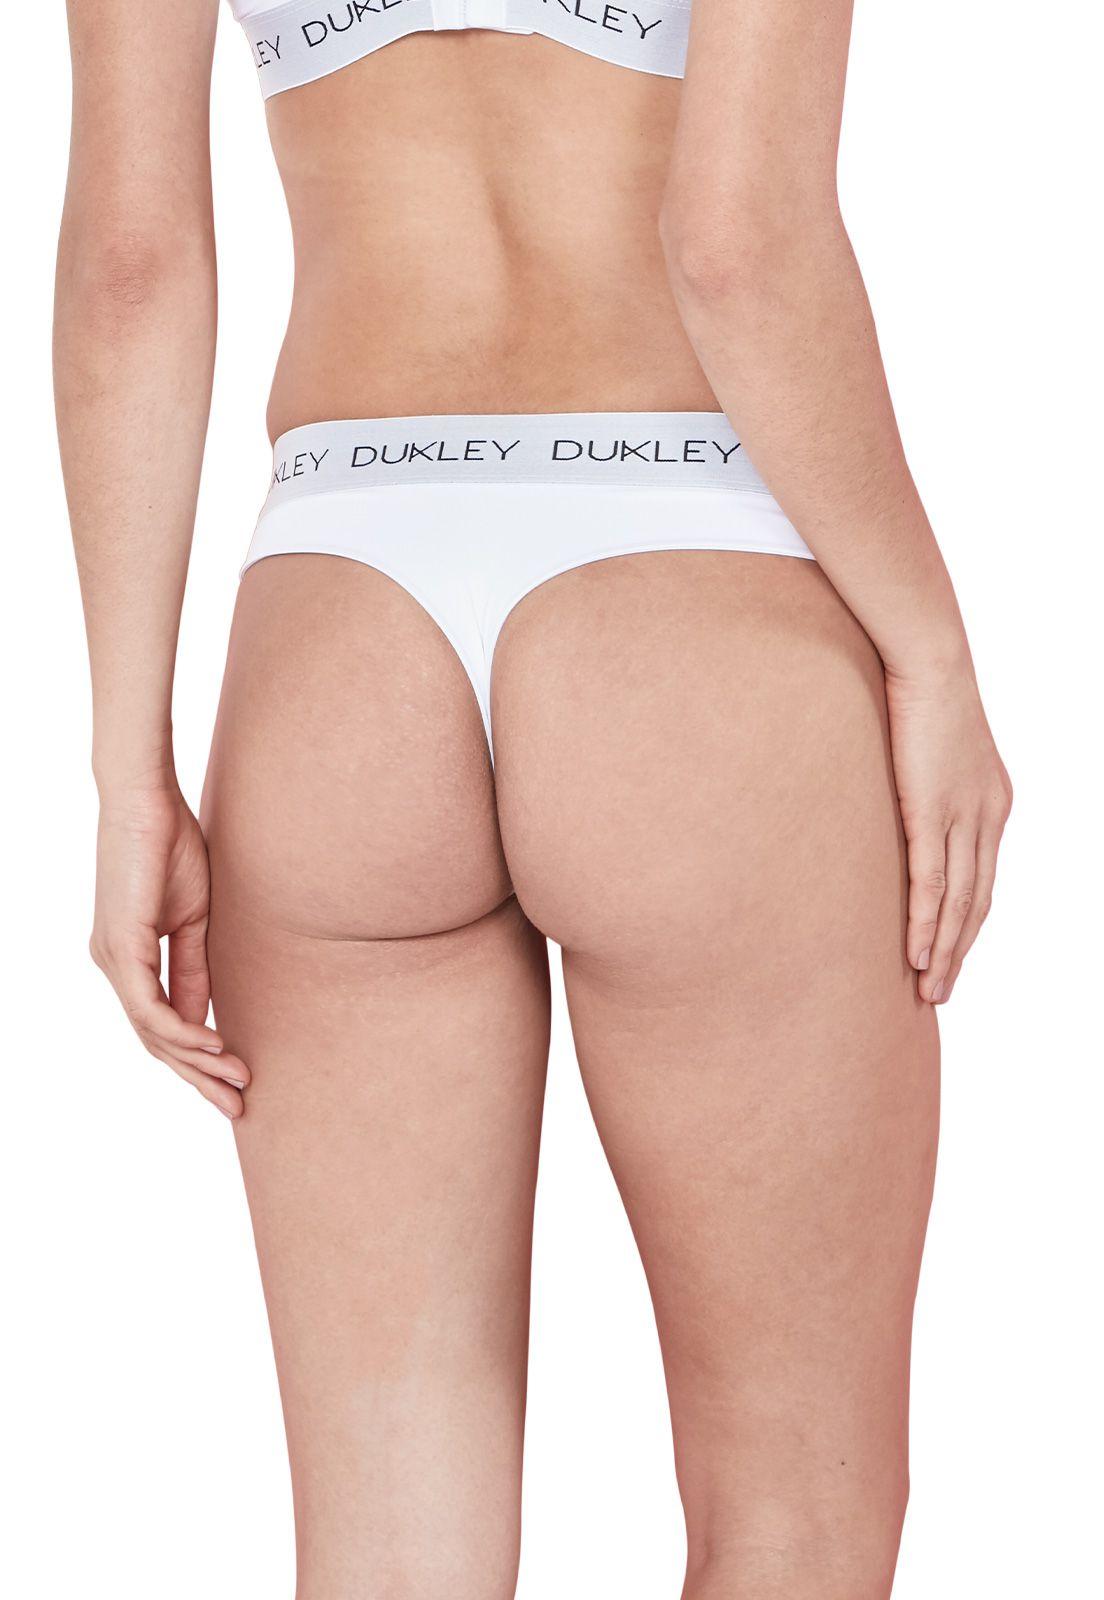 Fio Elastic - Dukley Lingerie Slim - 179